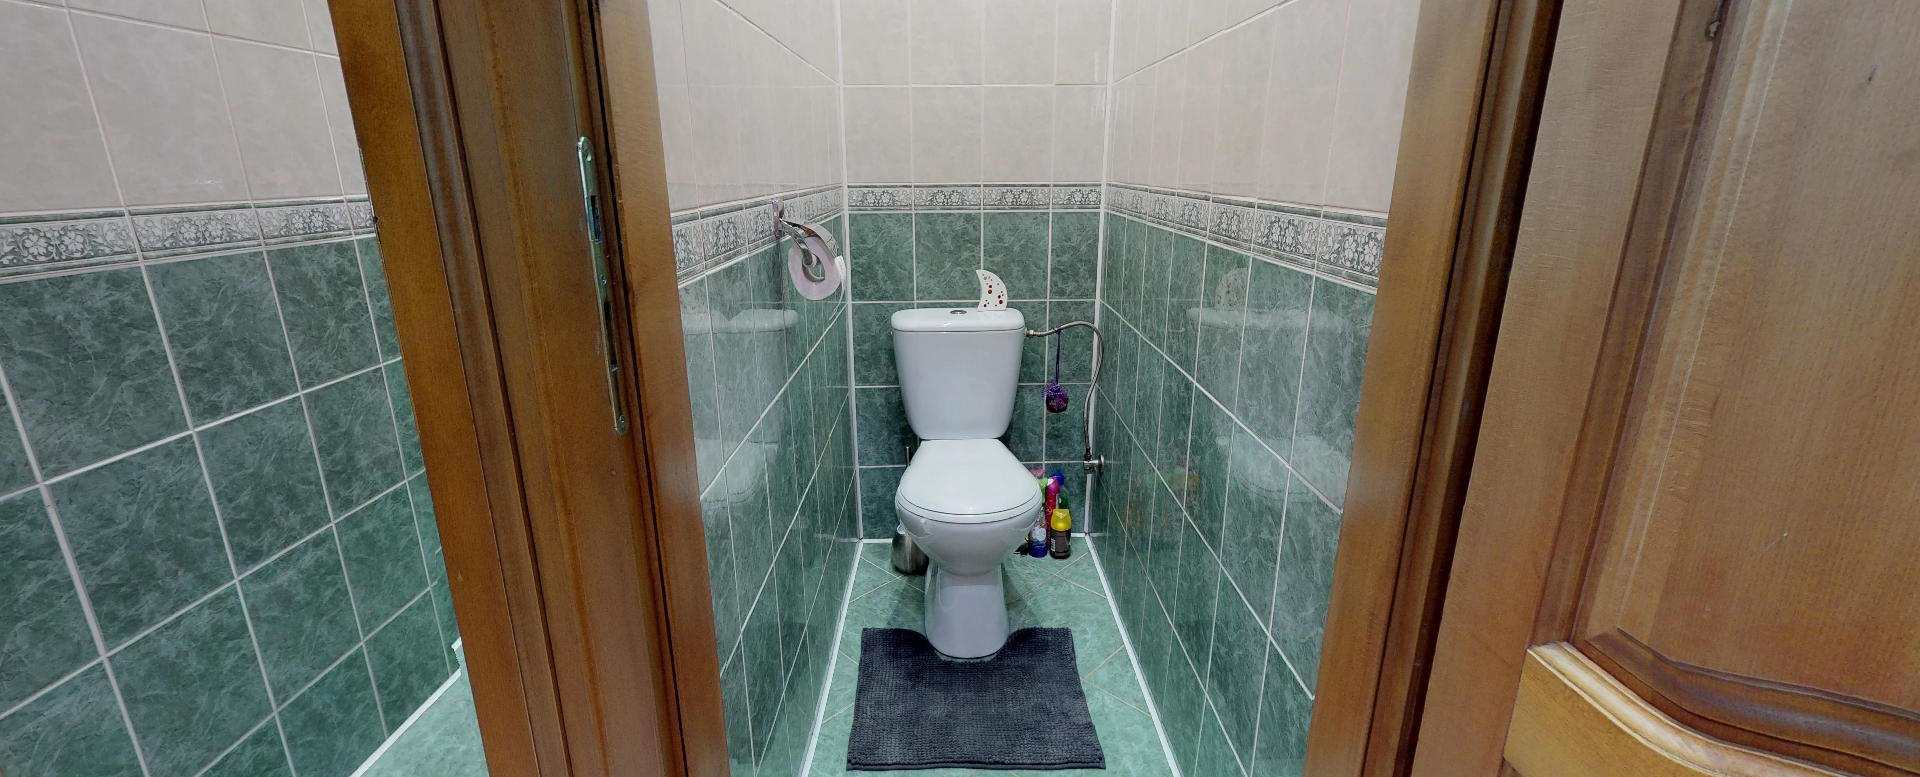 Pohľad na toaletu